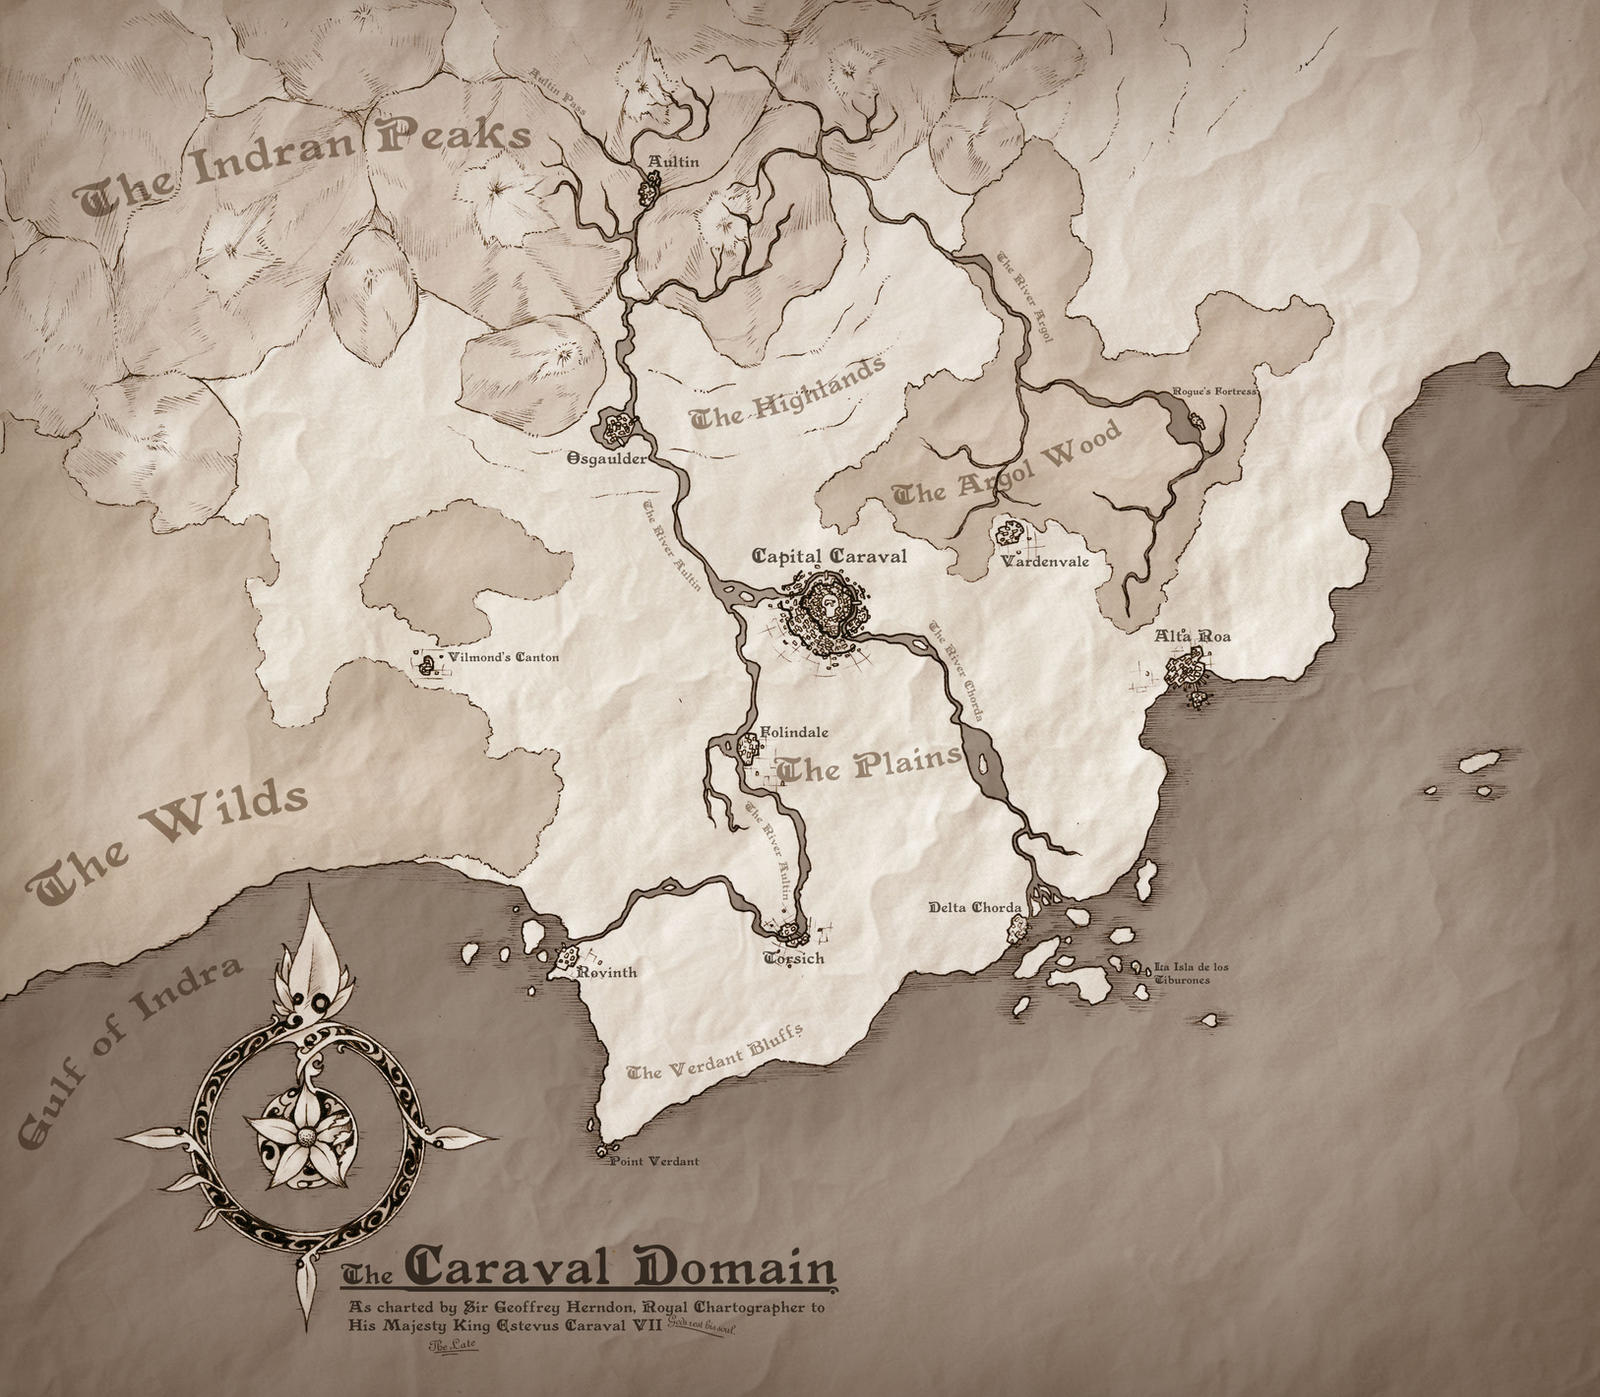 The Caraval Domain by Tekka-Croe